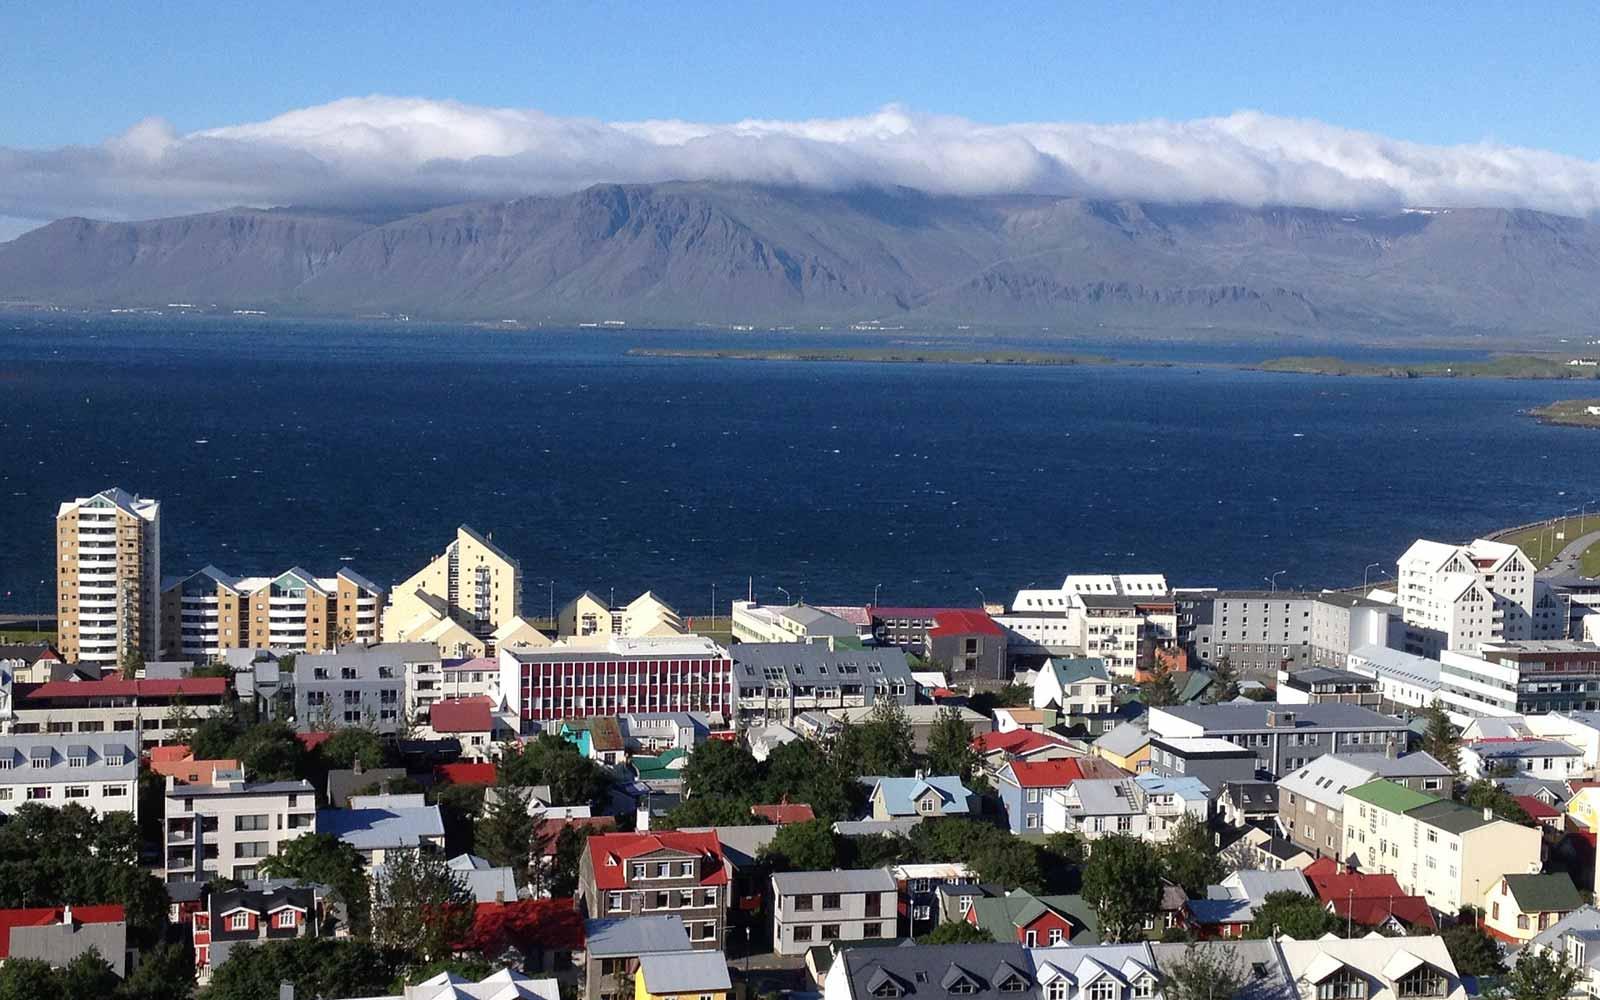 Überblick über Reykjavik,Island